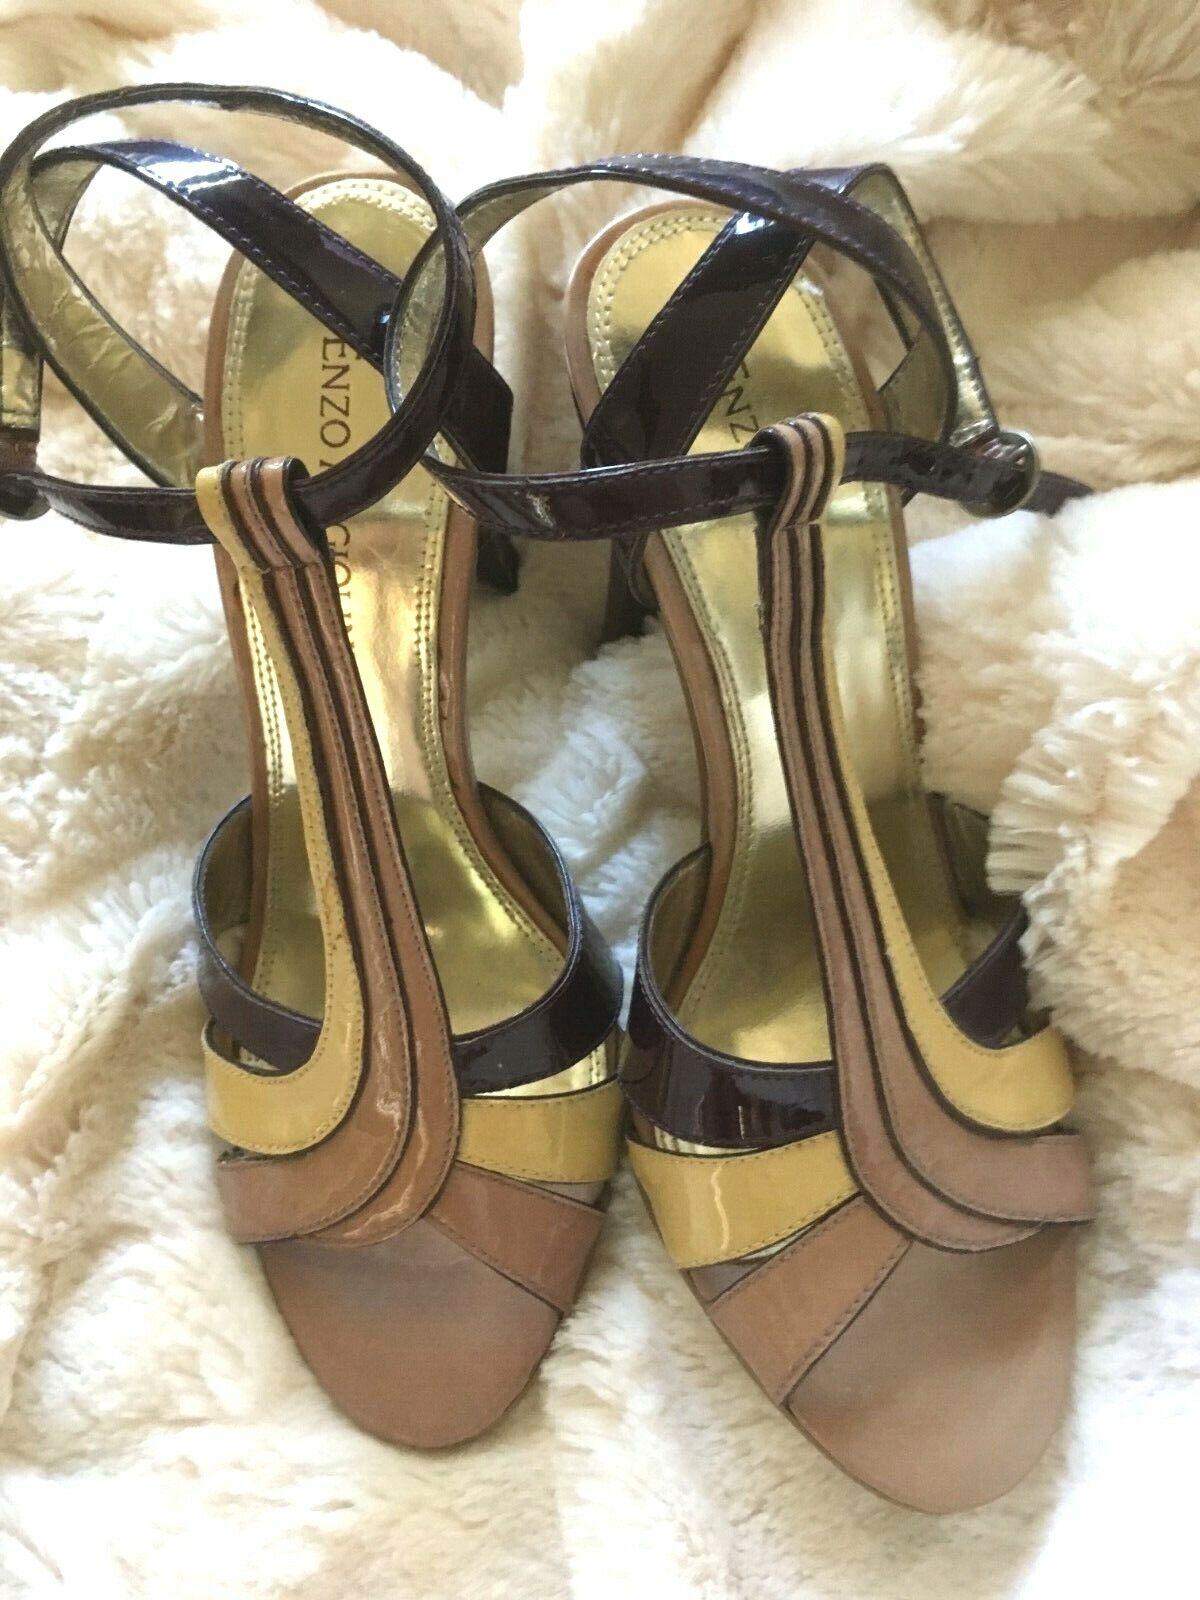 4bdf53c9241 Enzo Angiolini Leather Purple & Cream High Heels Heels Heels 88a461 ...